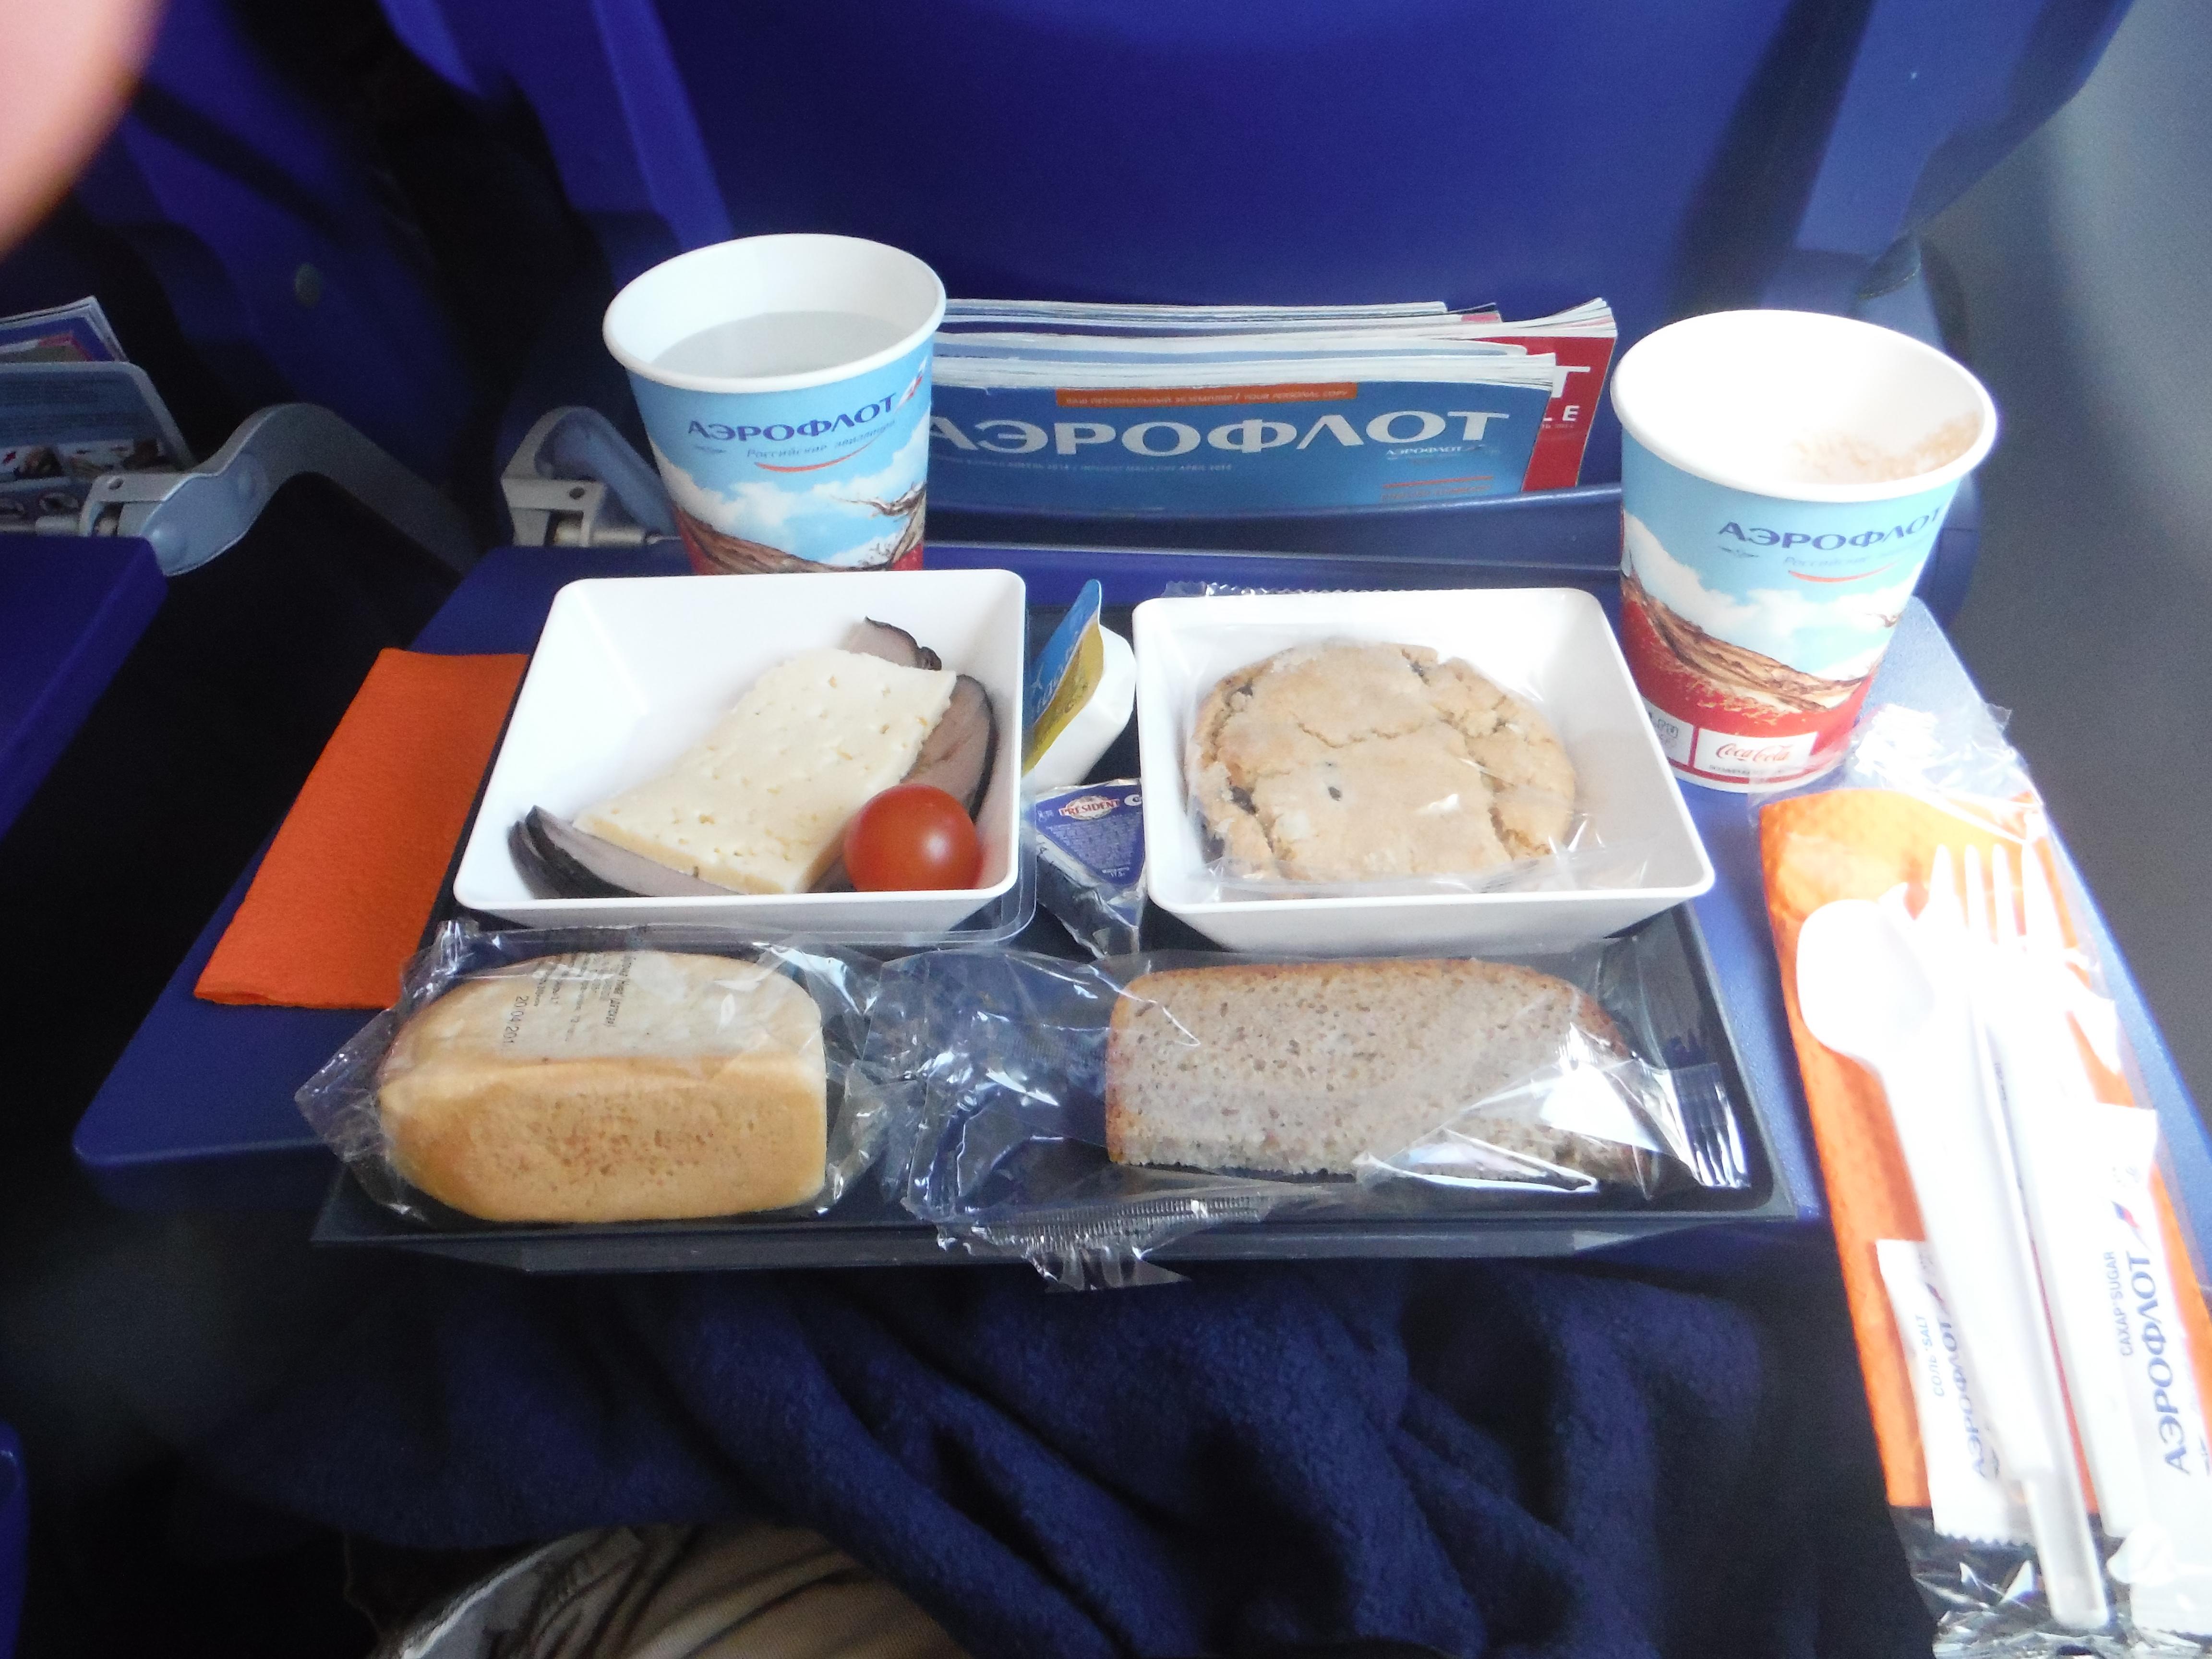 Economy class Aeroflot meal.